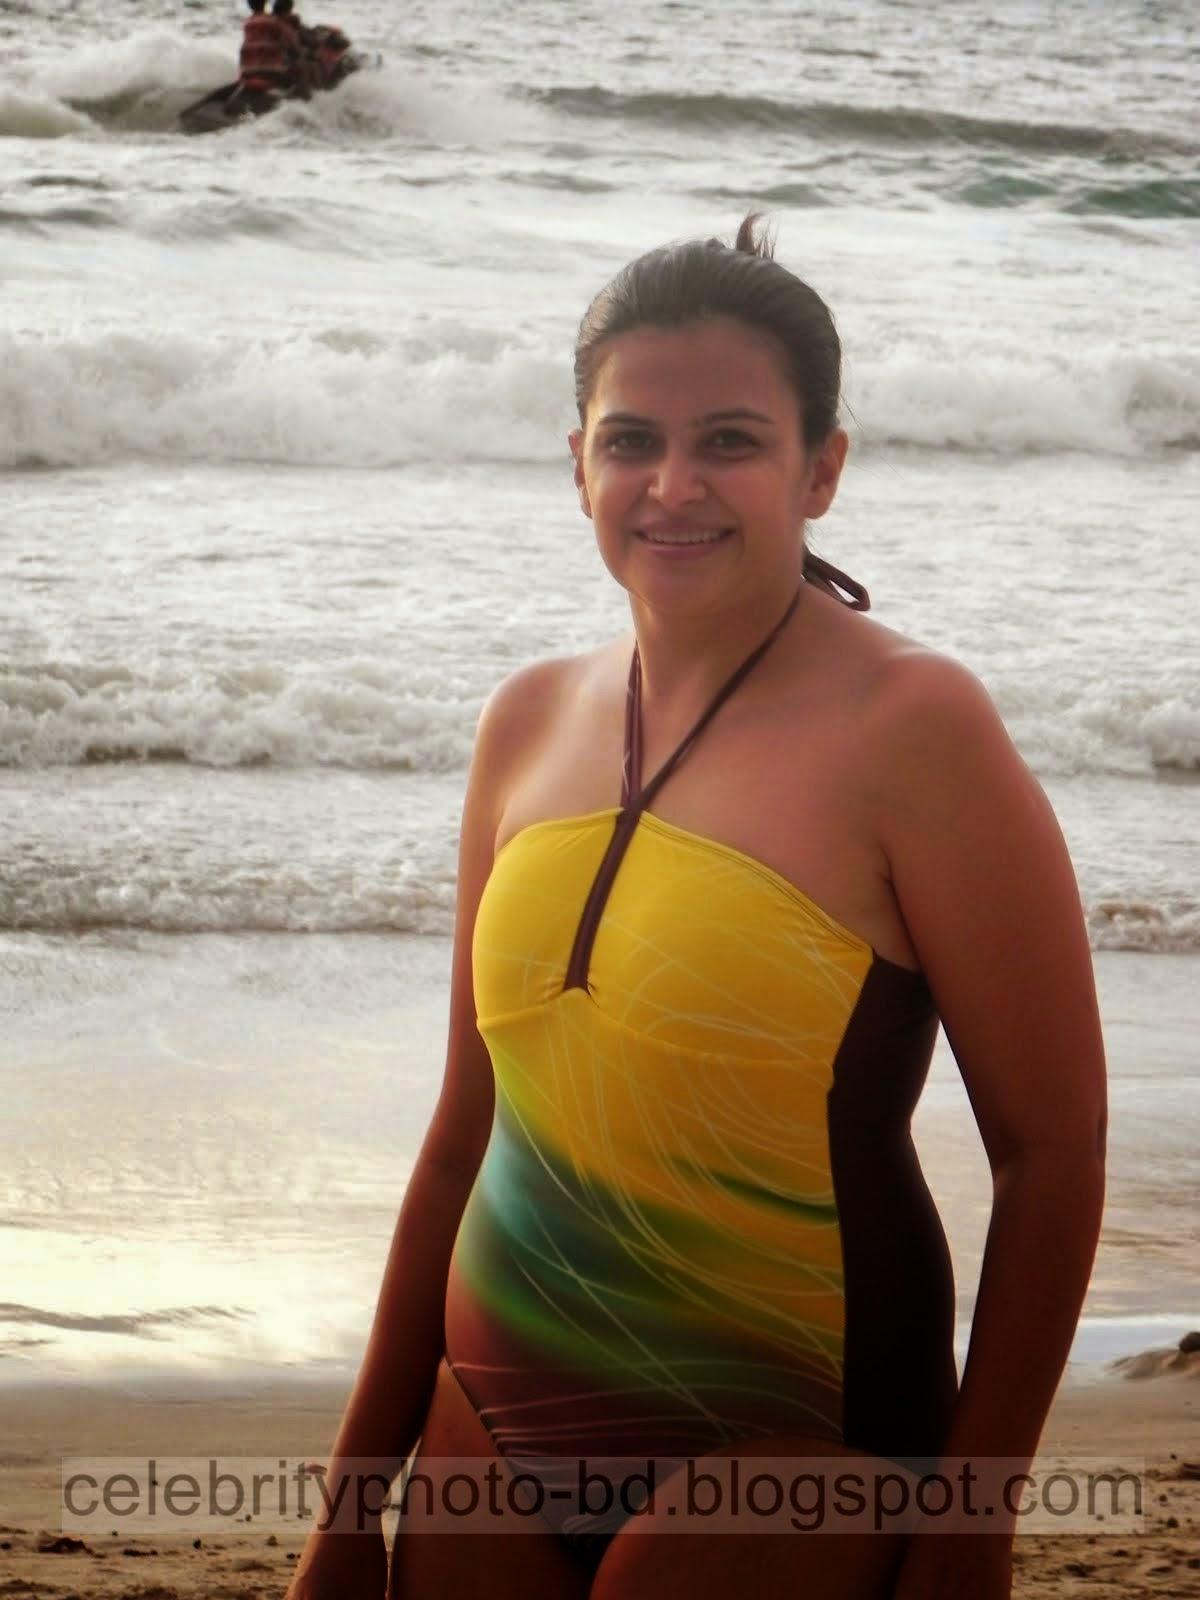 sylvan beach hindu single women Meet sylvan beach singles online & chat in the forums dhu is a 100% free dating site to find personals & casual encounters in sylvan beach.